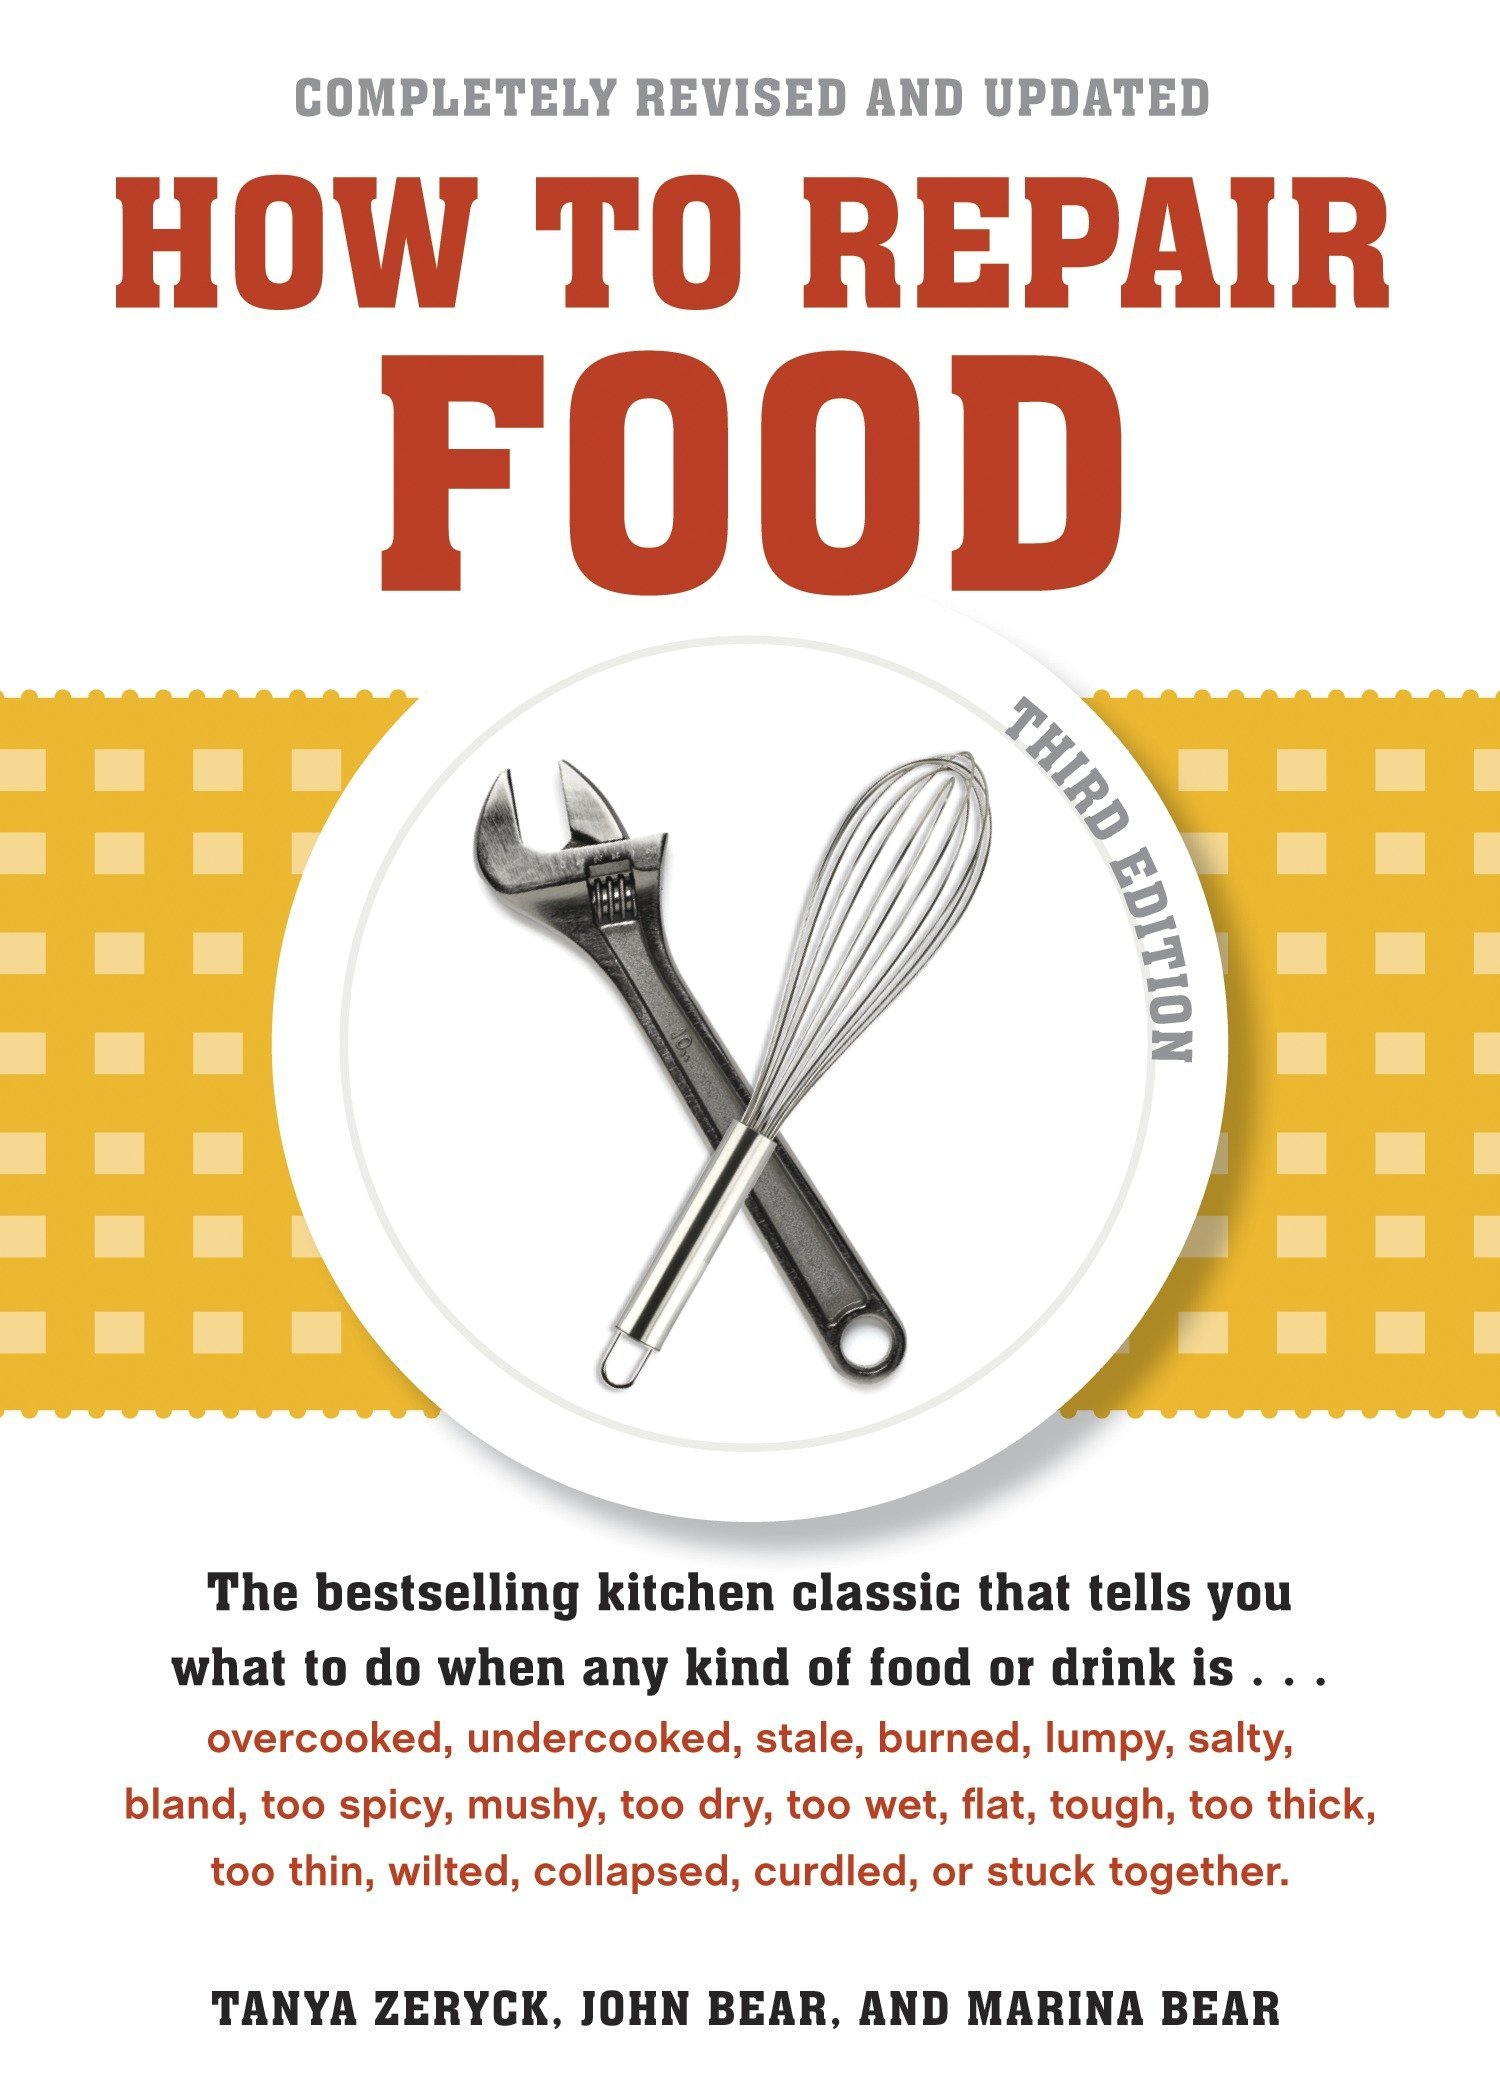 How to Repair Food, Third Edition: Tanya Zeryck, John Bear, Marina Bear:  9781580084321: Amazon.com: Books